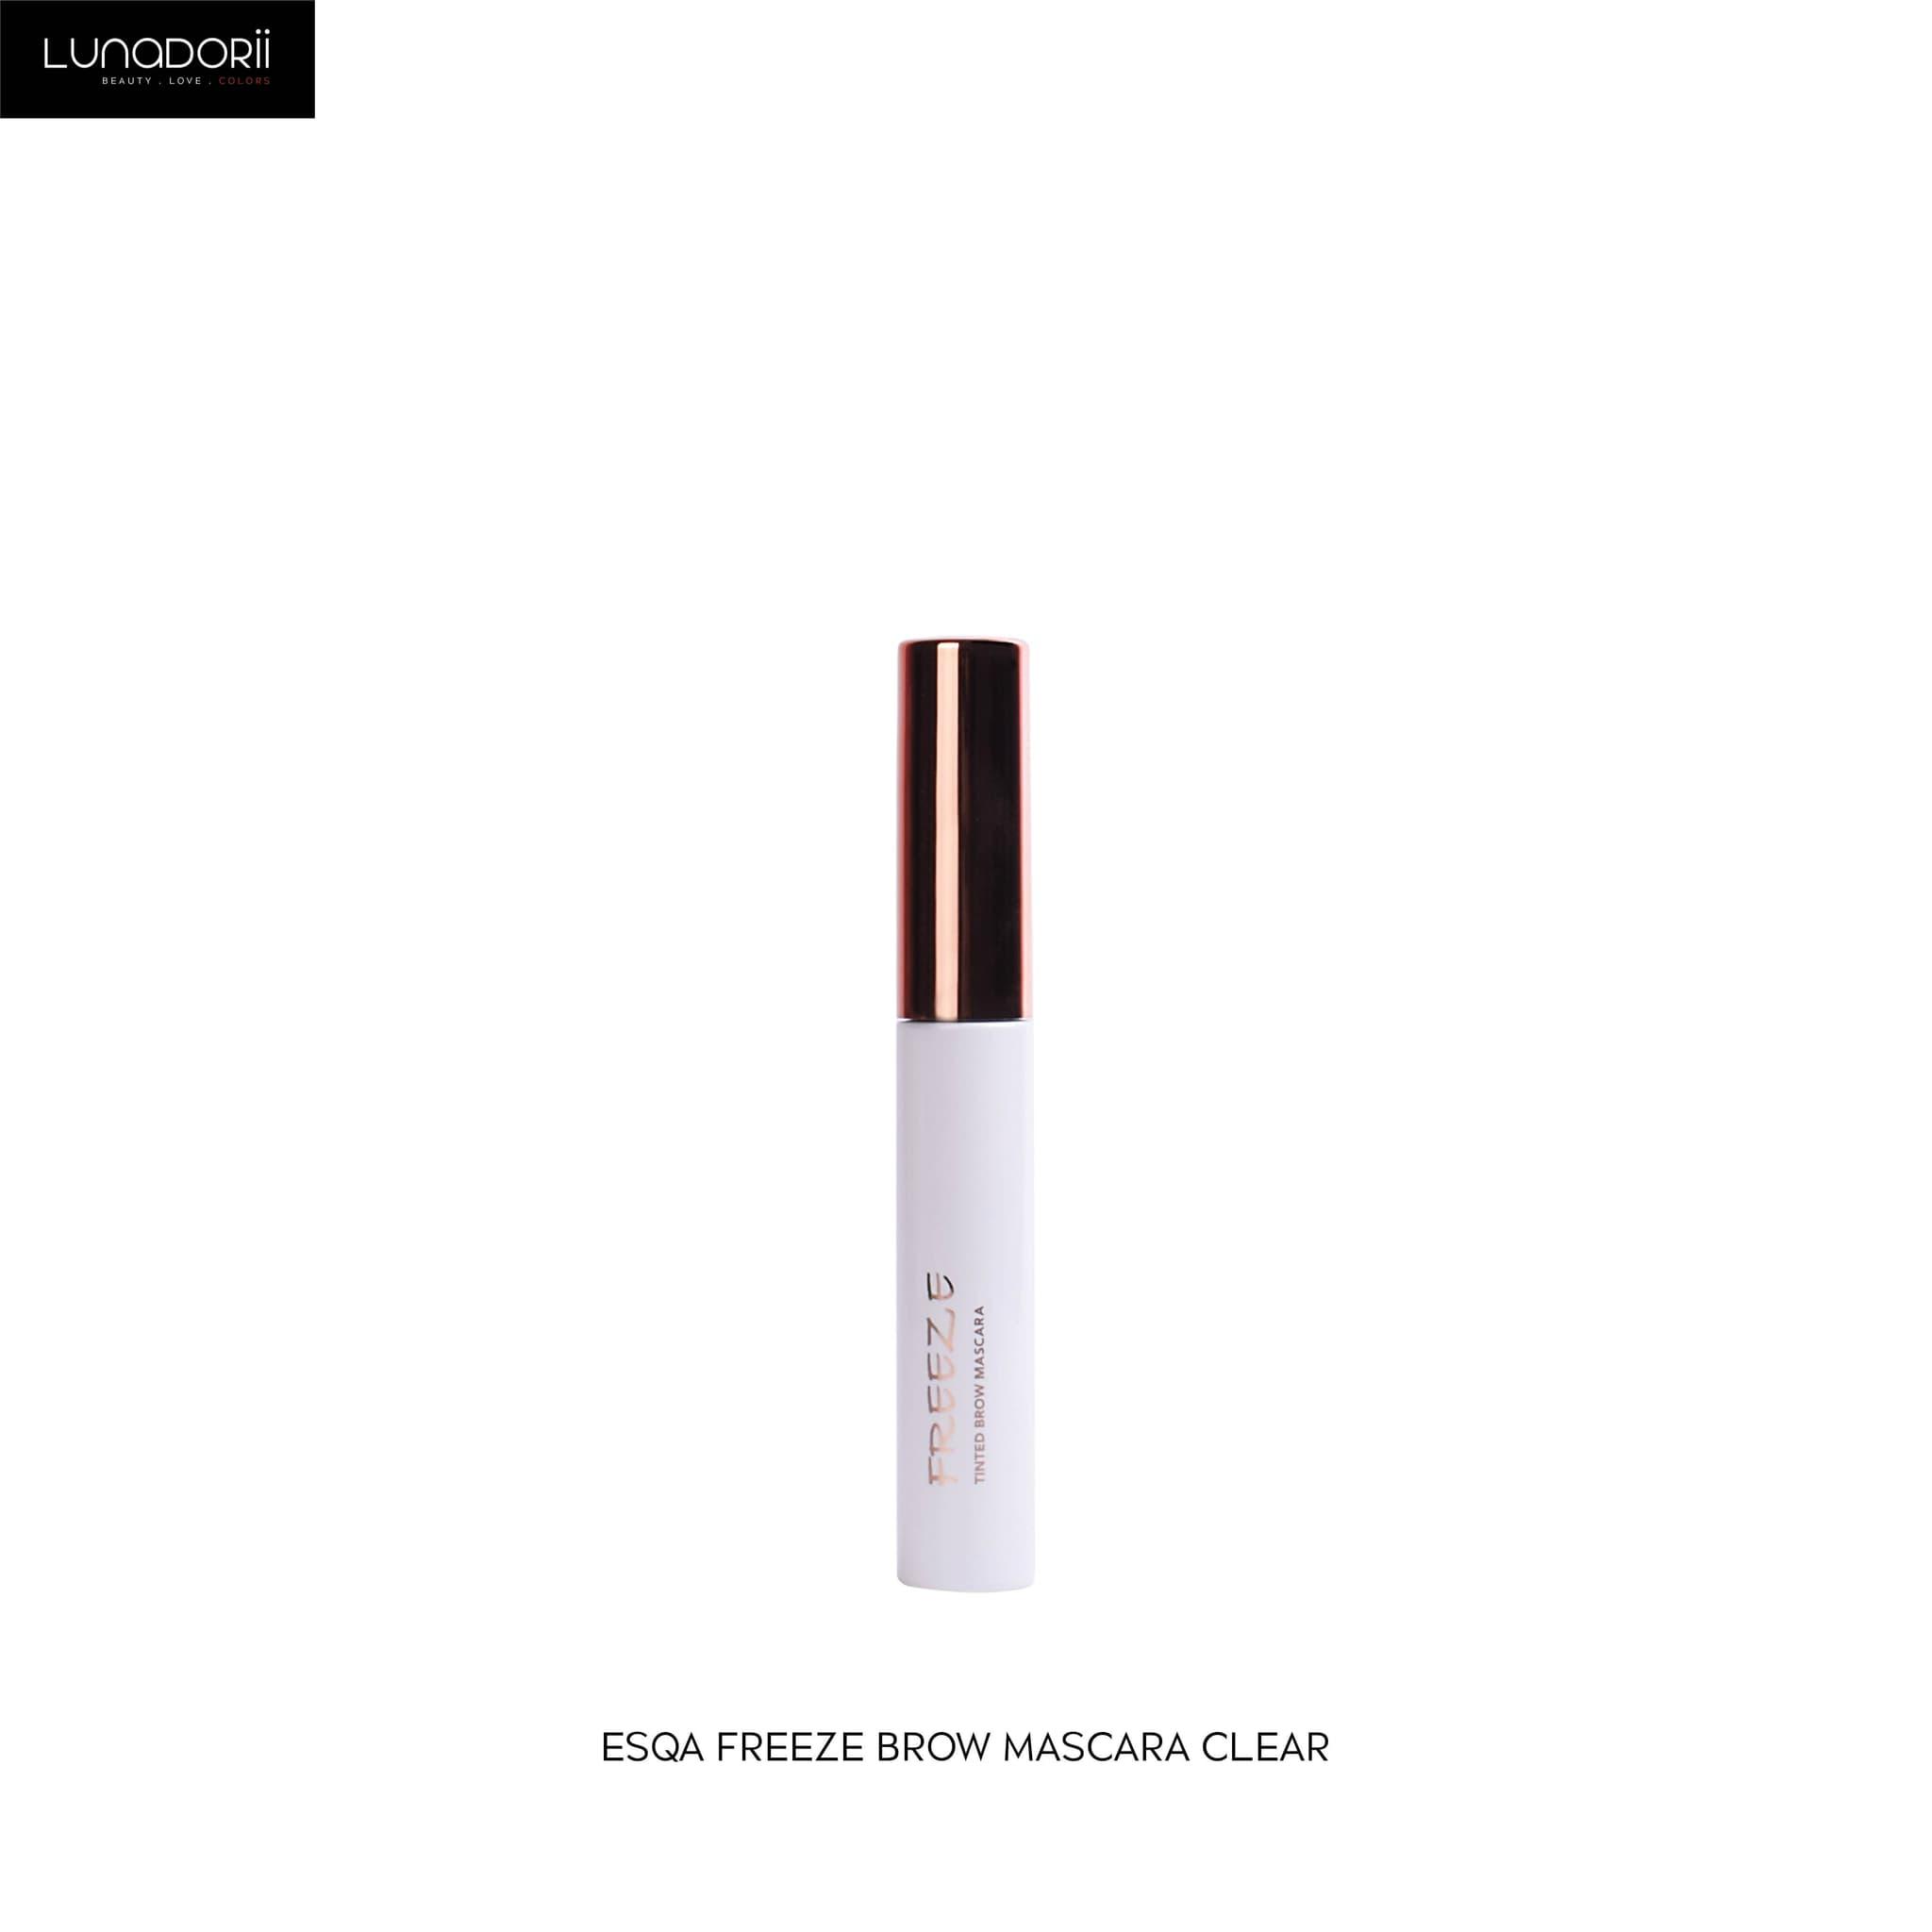 Esqa - Freeze Brow Mascara Clear thumbnail